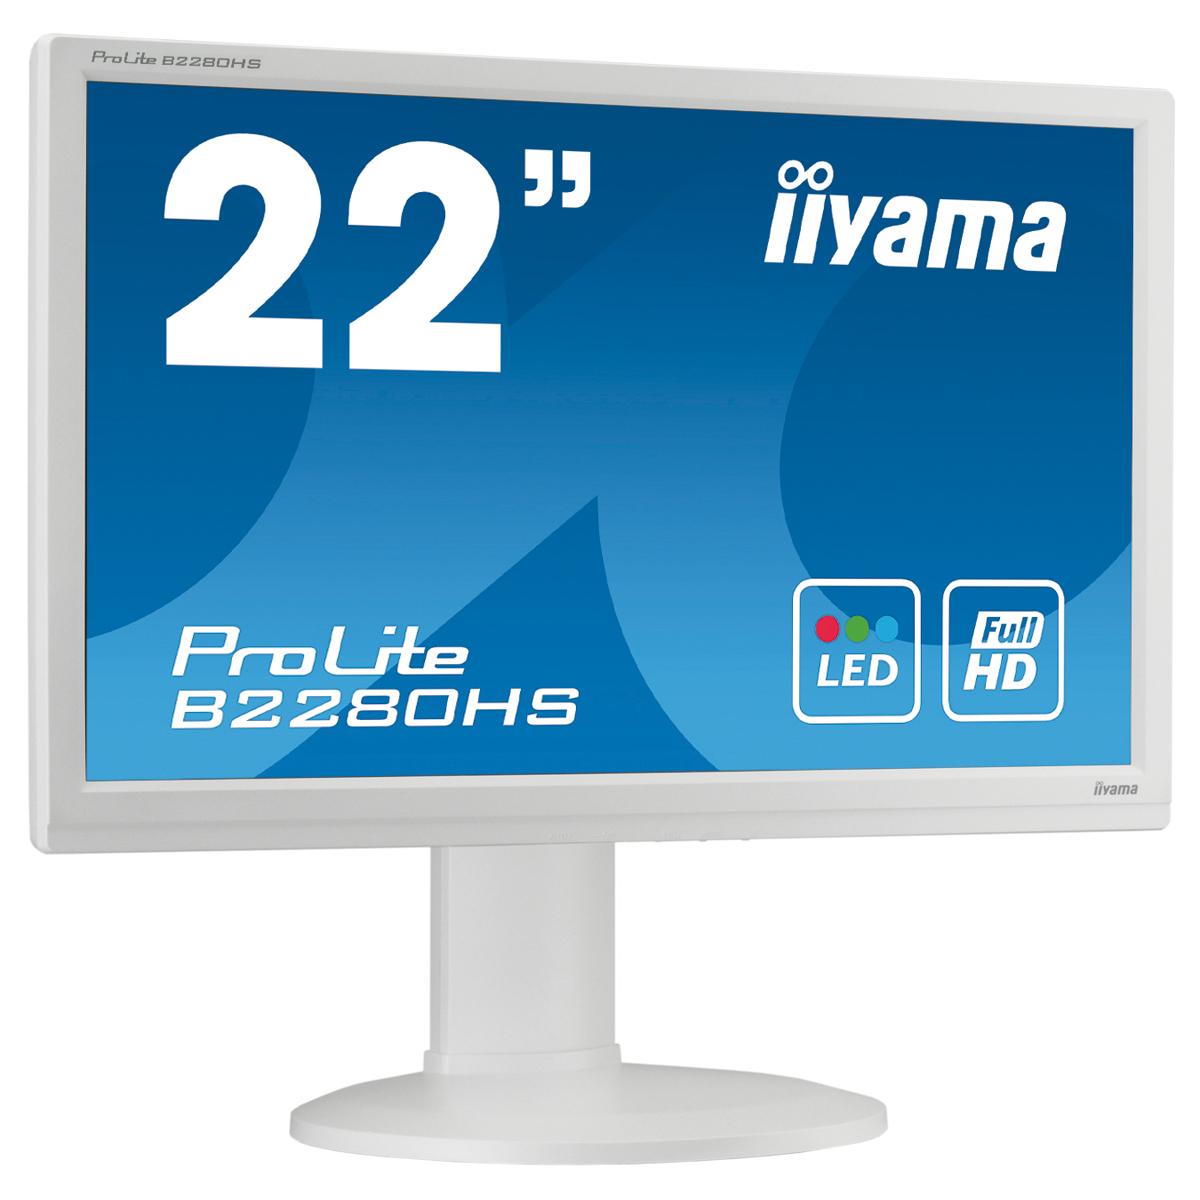 Iiyama 21 5 led prolite b2280hs blanc ecran pc iiyama for Ecran pc blanc 24 pouces